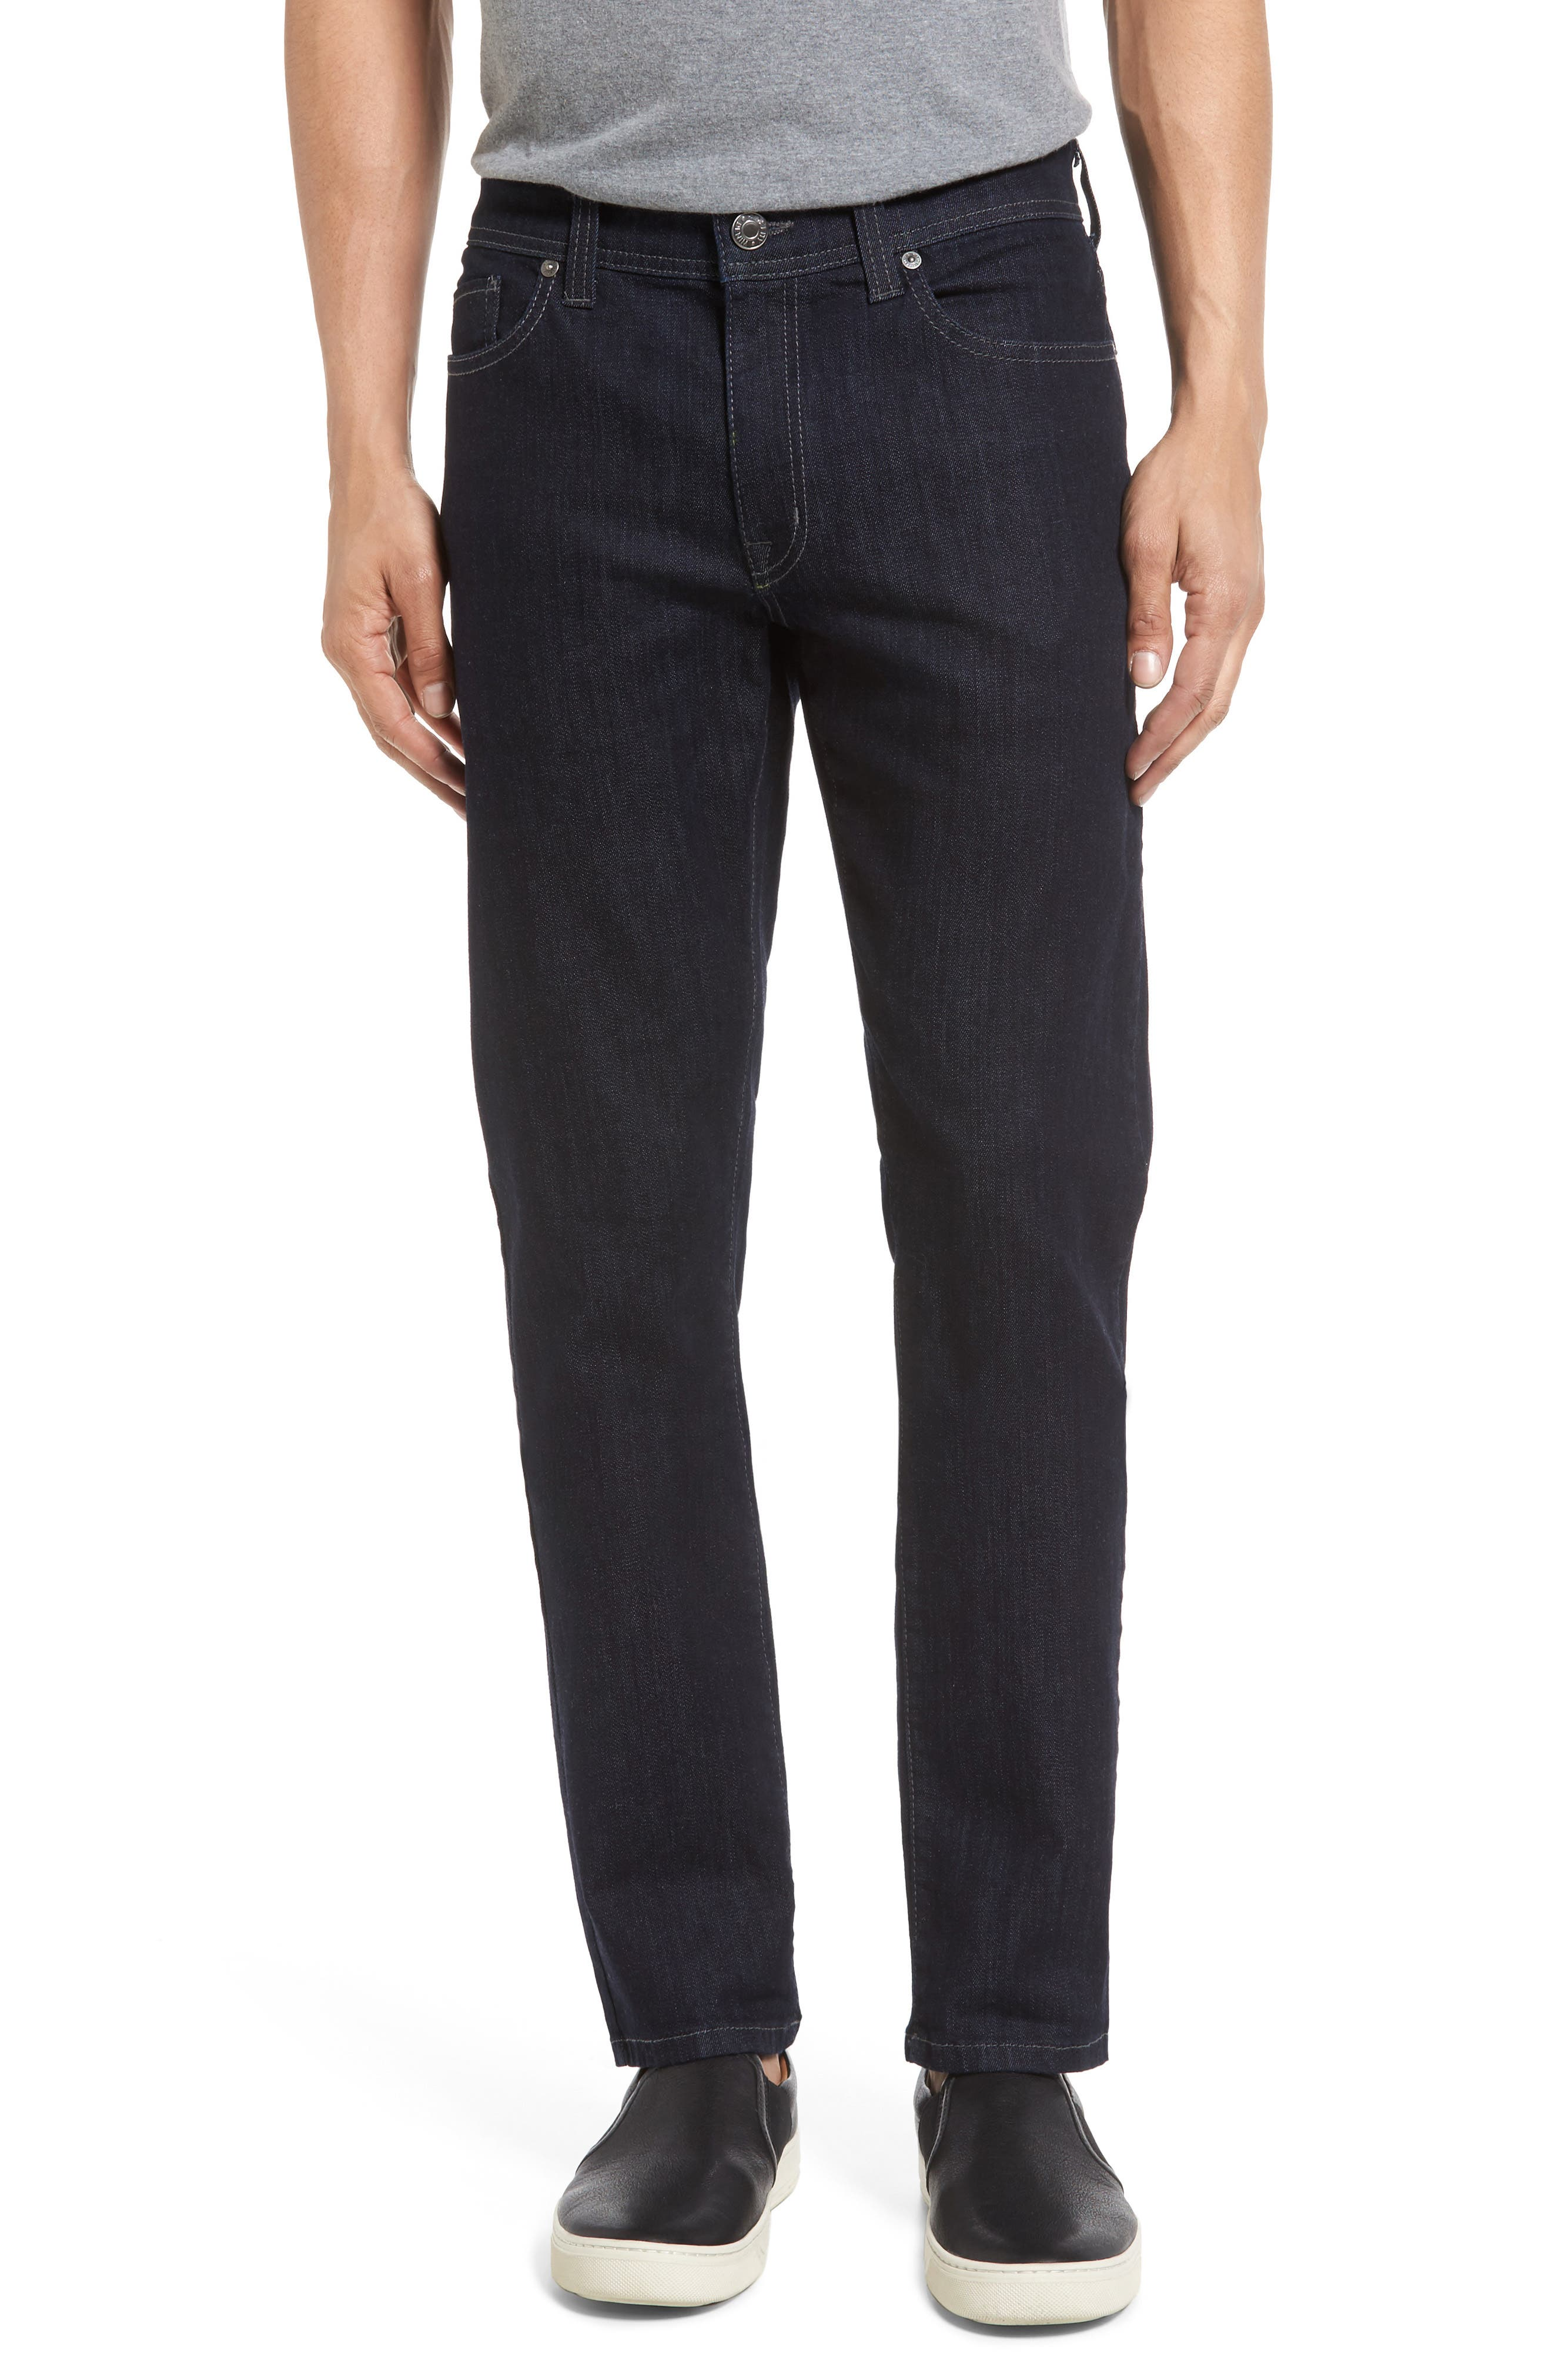 Alternate Image 1 Selected - Fidelity Denim Torino Slim Fit Jeans (Capital Blue)